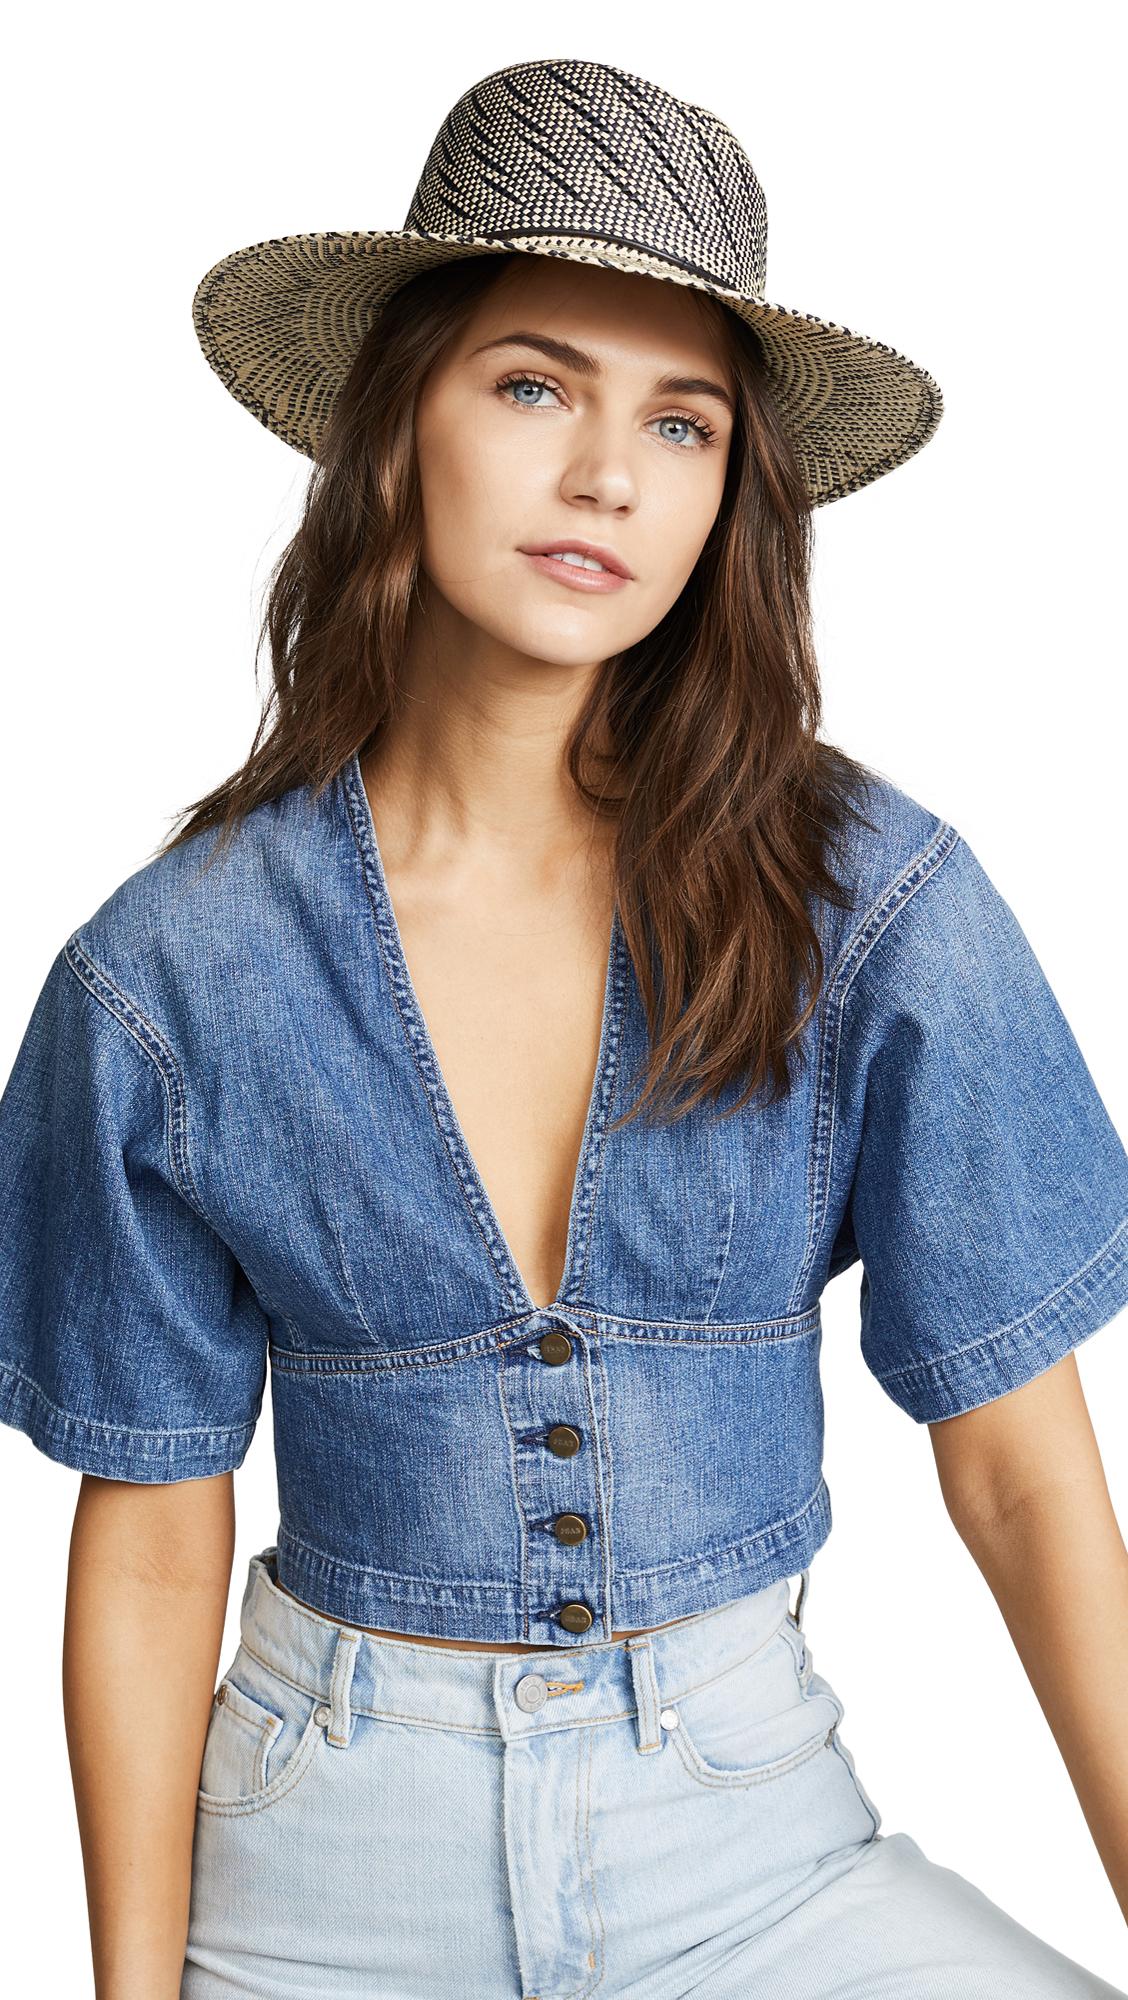 Zoe Two-Tone Straw Hat in Navy Multi